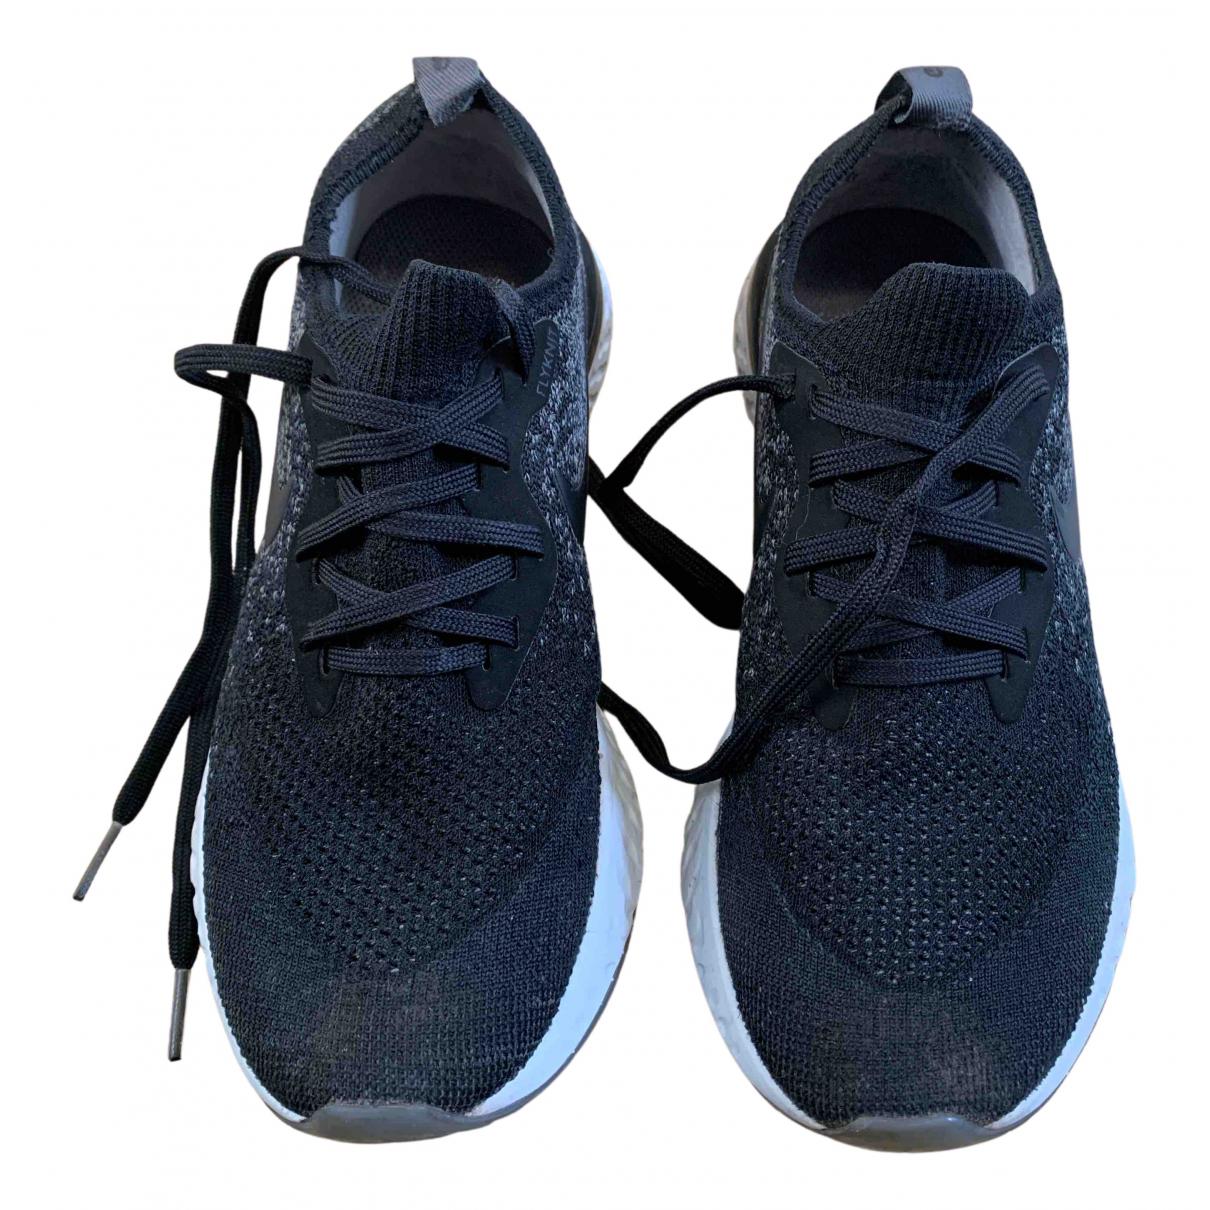 Nike - Baskets Flyknit Racer pour femme en toile - multicolore